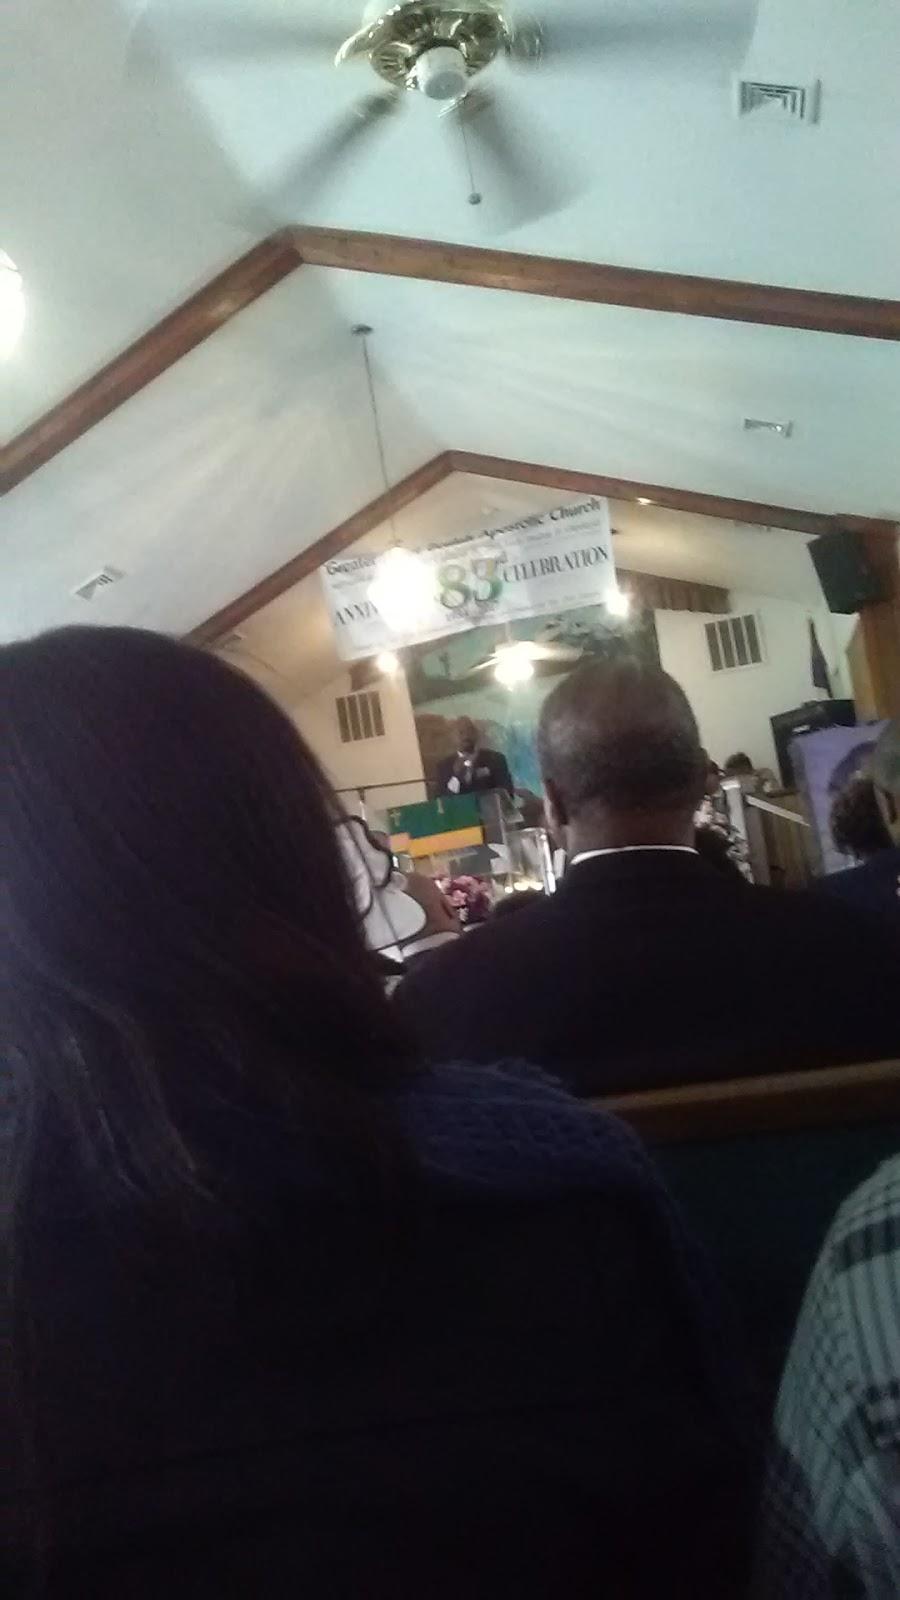 Greater Sweet Beulah Holiness - church  | Photo 4 of 4 | Address: 137 Maple St, Suffolk, VA 23434, USA | Phone: (757) 539-9535